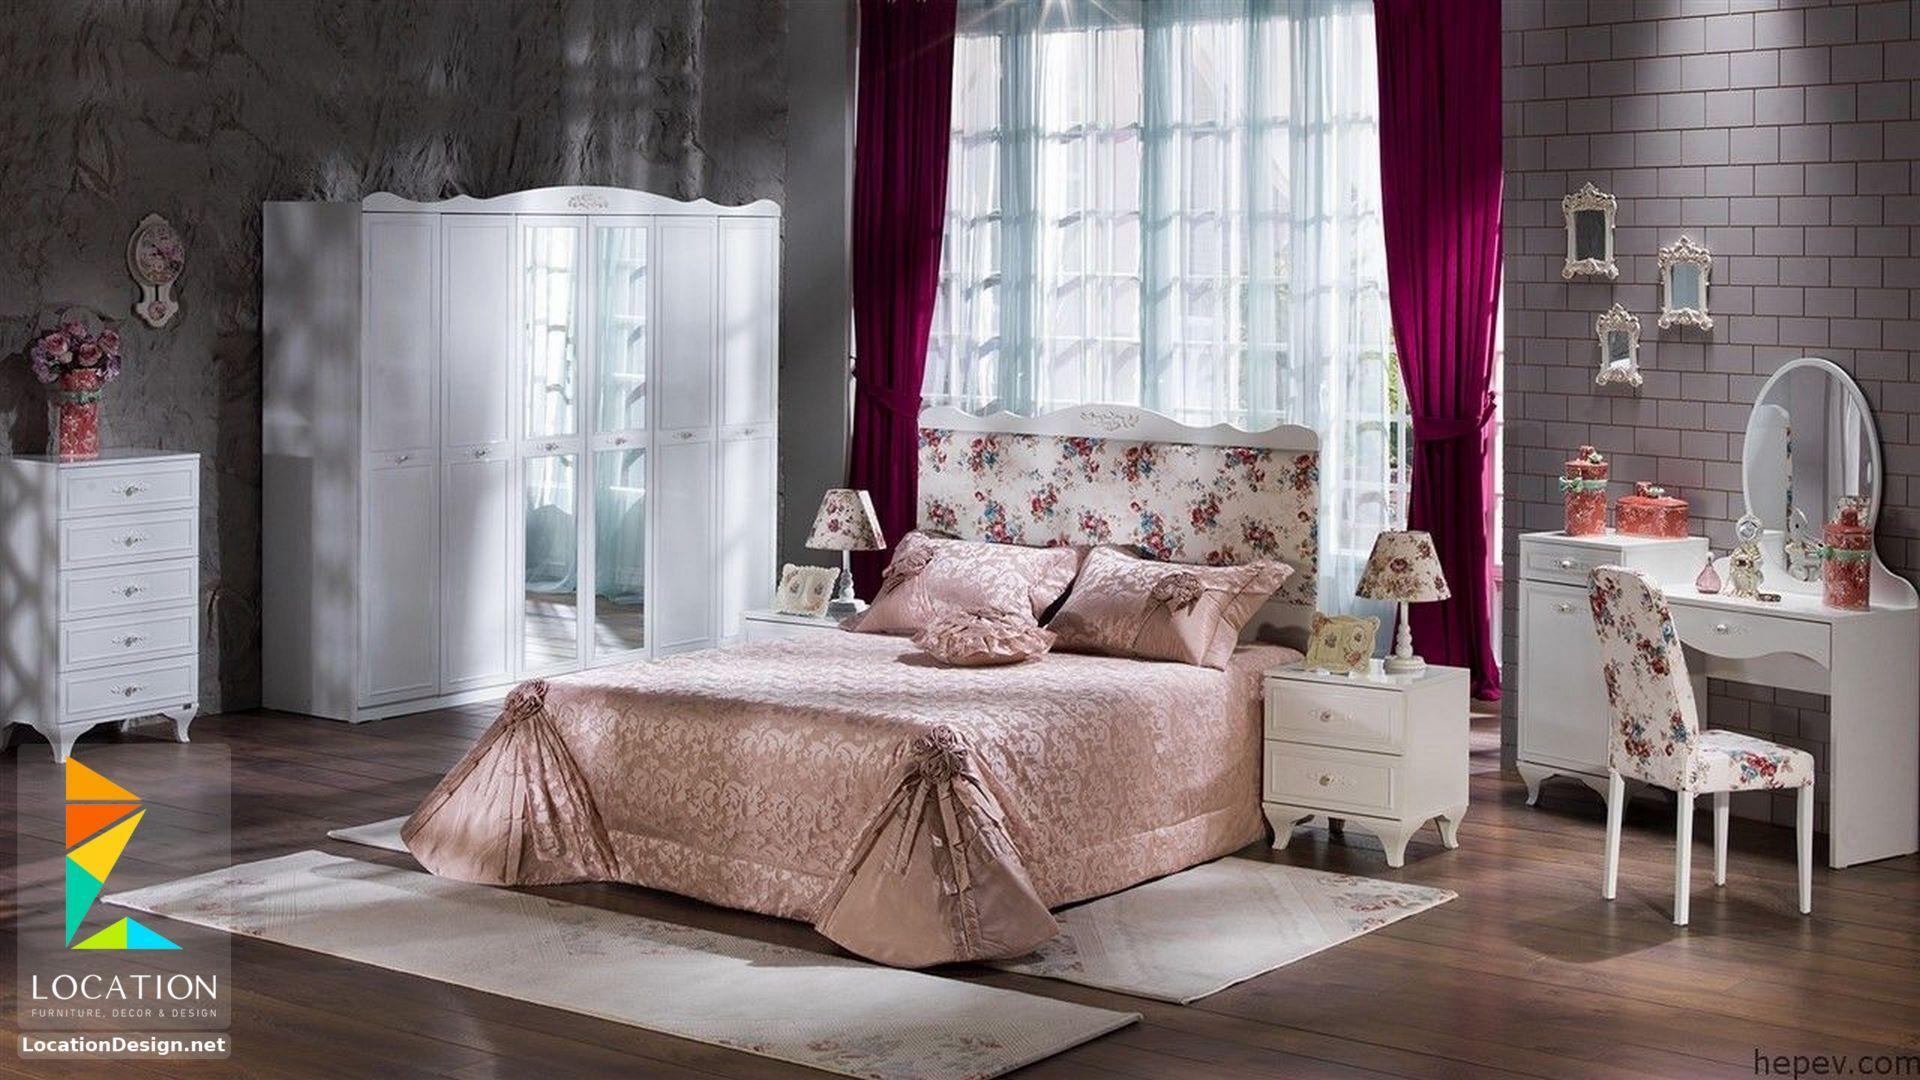 احدث موديلات و اشكال غرف نوم تركي 2019 2020 Furniture Home Decor Home